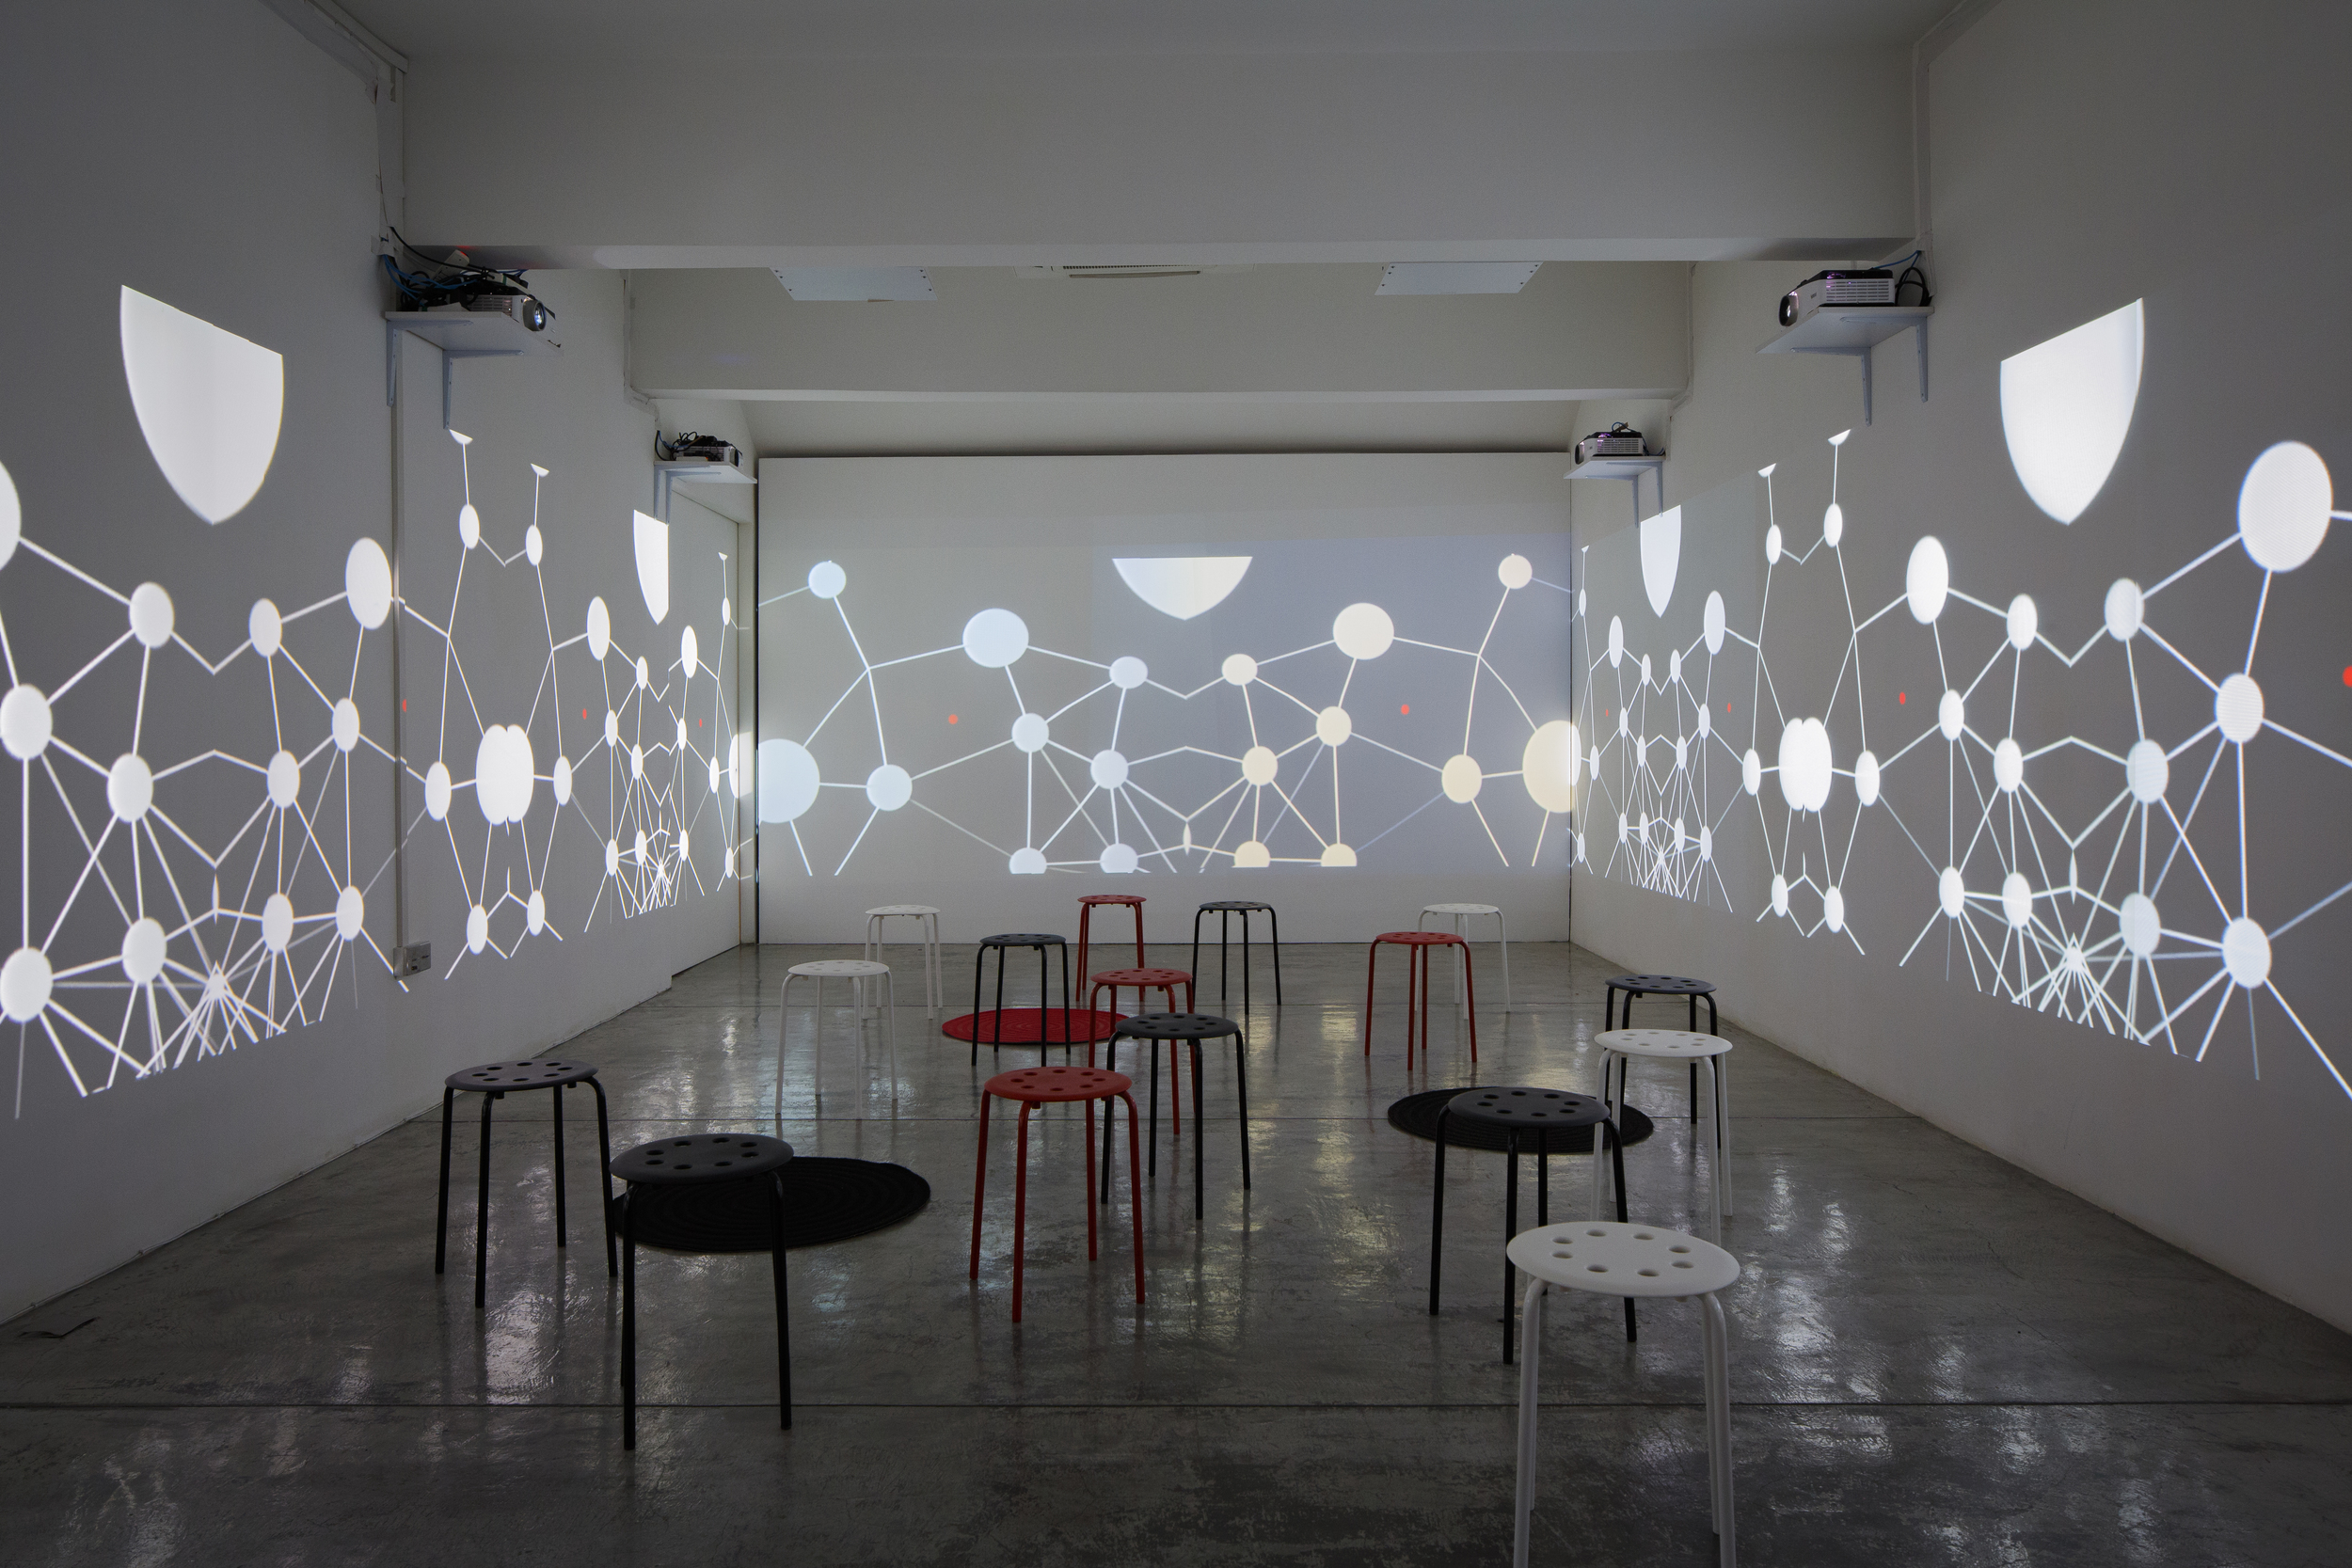 M_Event_Art-Basel_Hong-Kong_Sheldon_20150312_01732.jpg